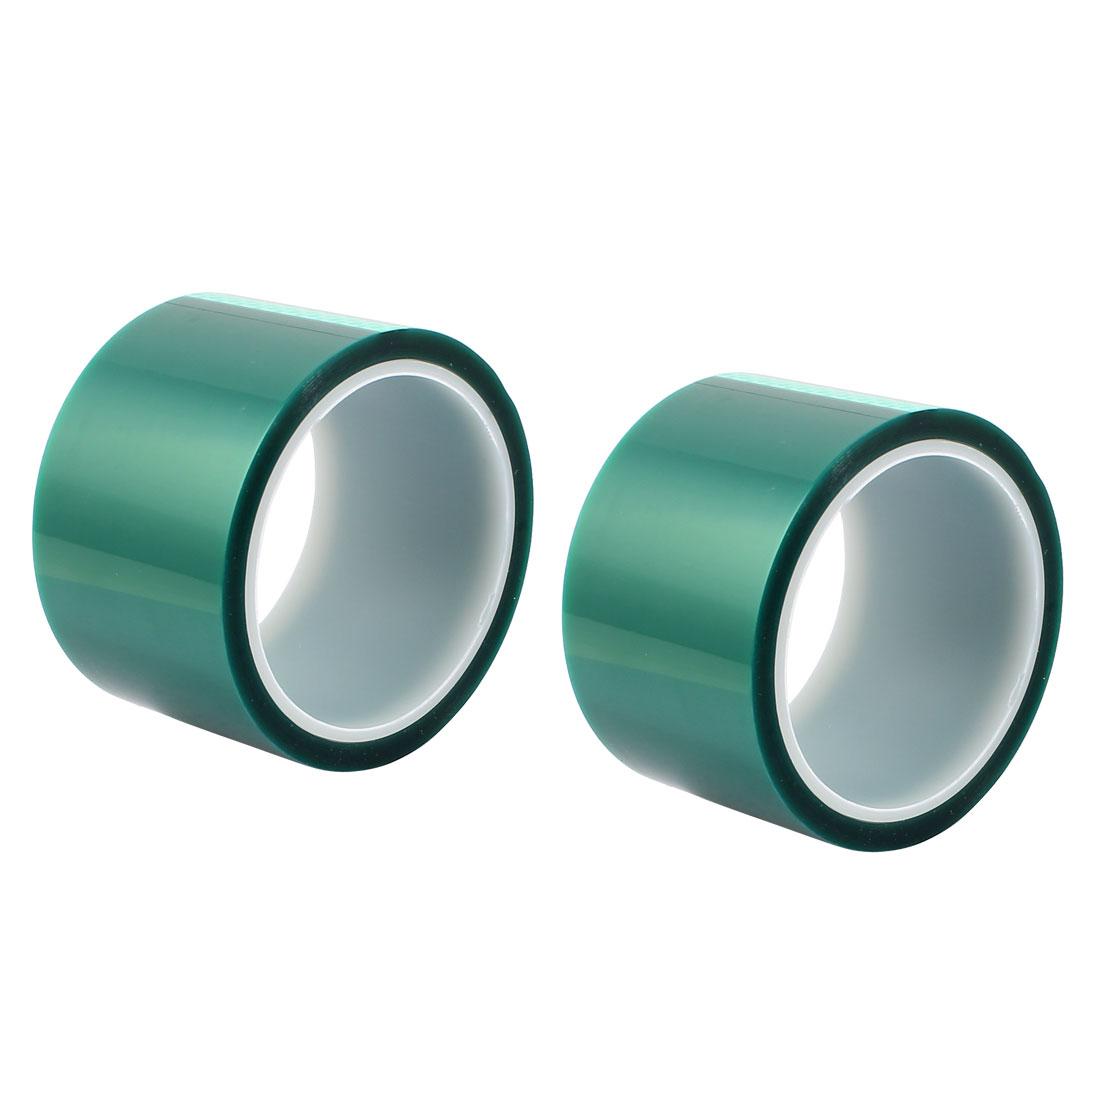 2pcs 60mm Width 33M Long Green PET High Temperature Heat Resistant PCB Solder Tape